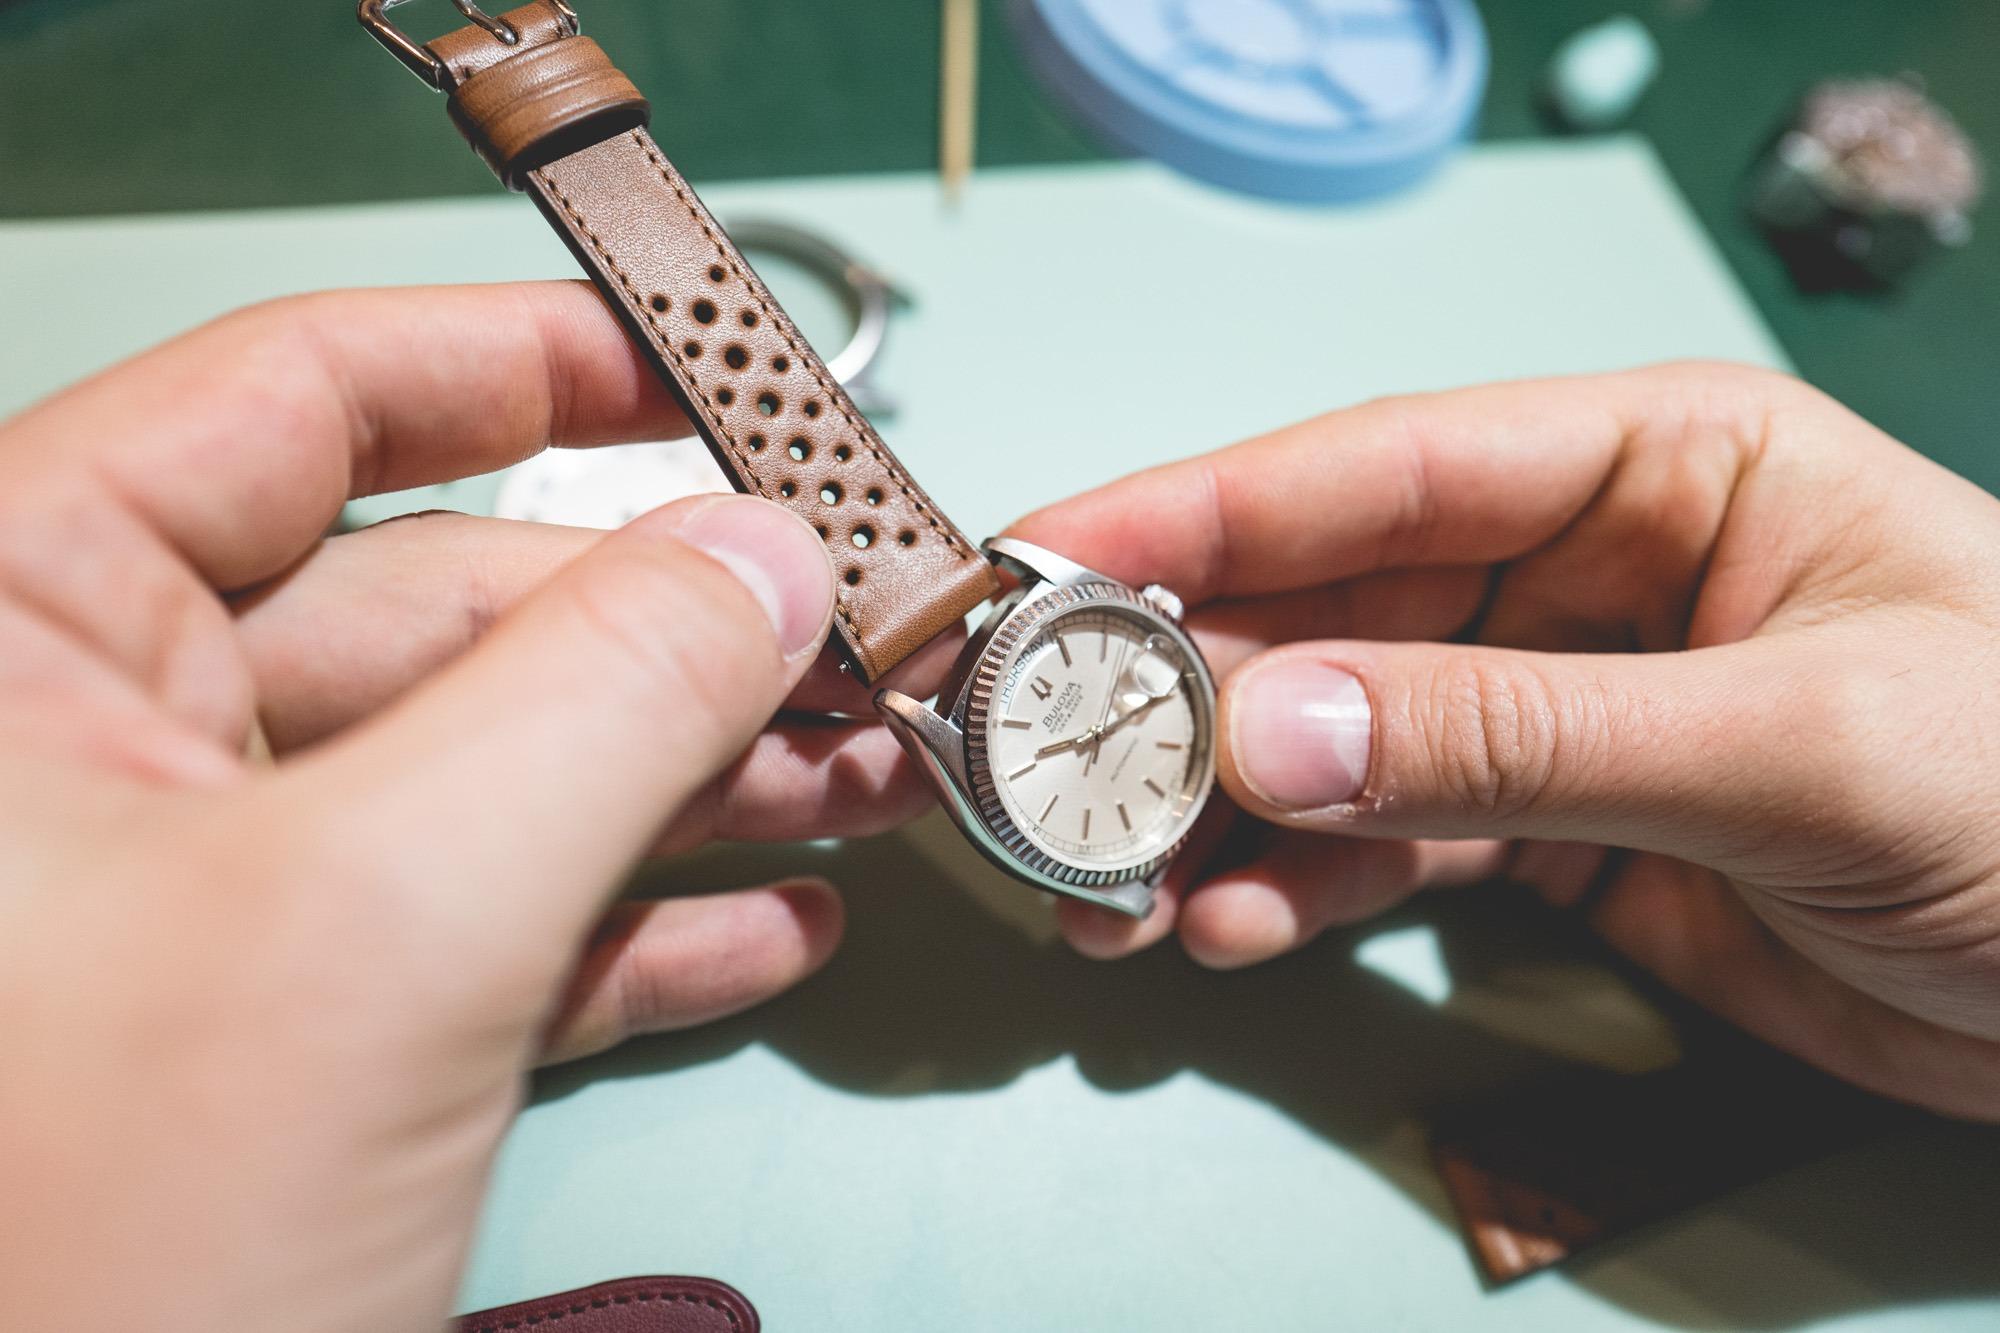 Cours d'horlogerie - Bracelet Rallye marron